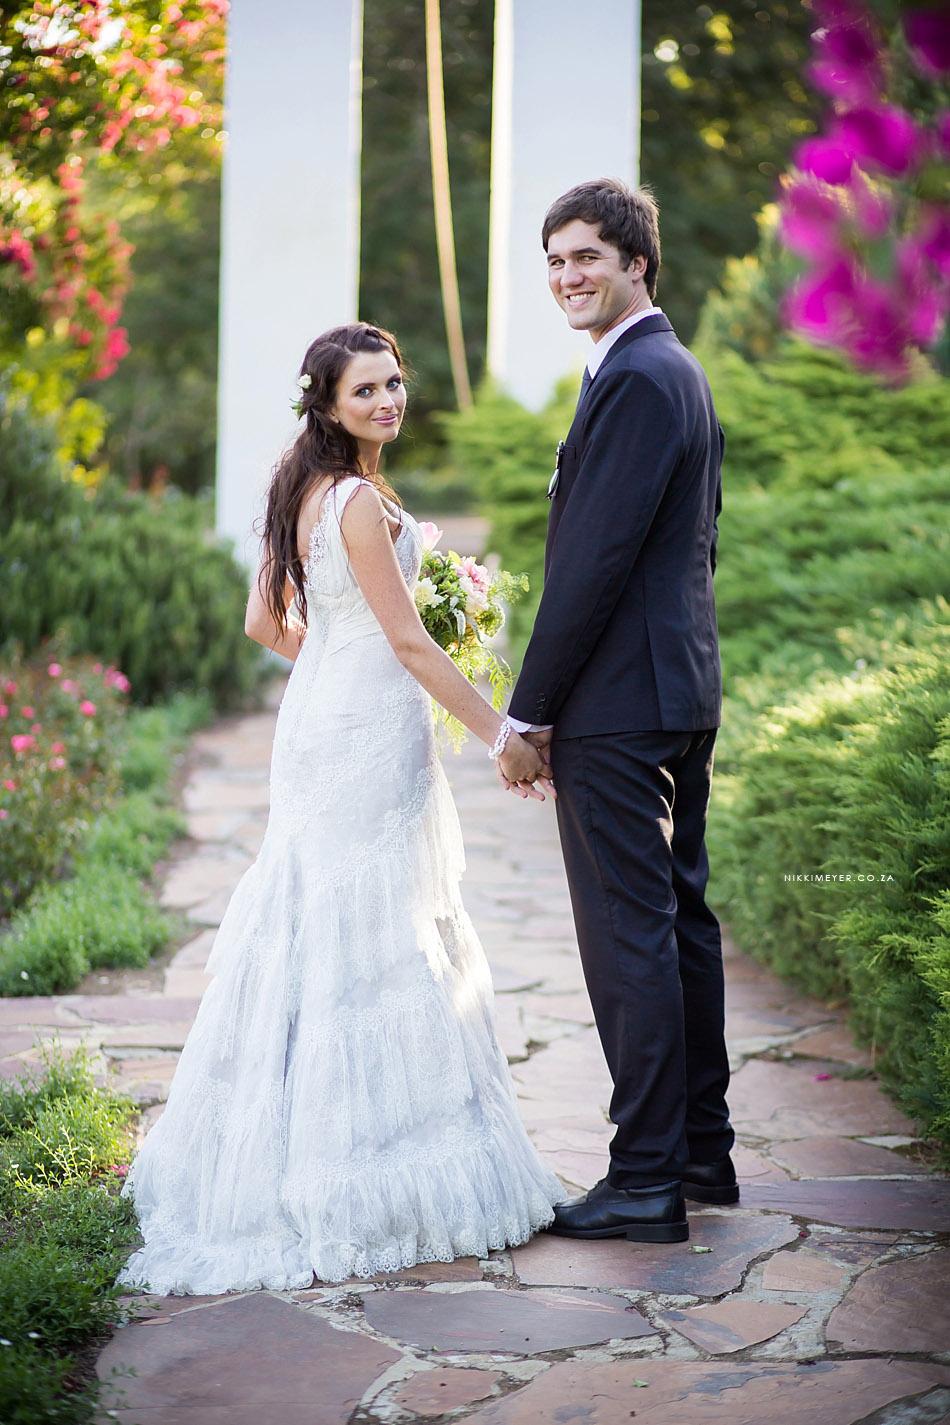 nikki_meyer_nooitgedacht_wedding_stellenbosch_049